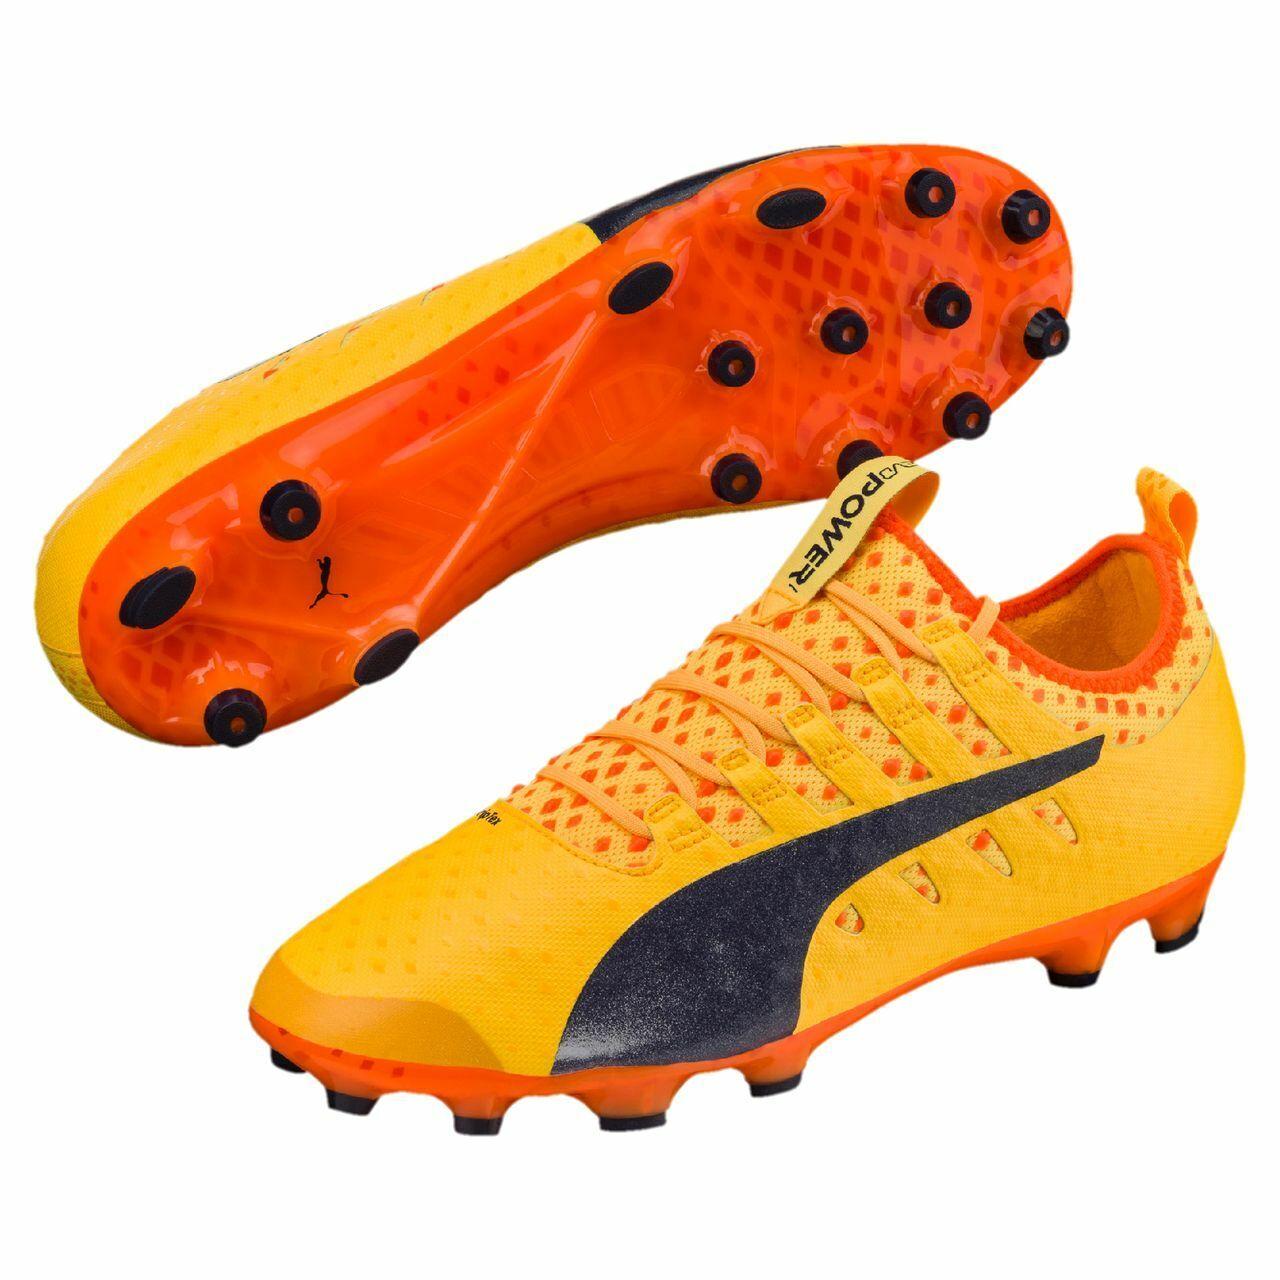 Puma Fußballschuhe evo POWER Vigor 1 AG 103825 03 Fußball Fußball Fußball Herren e6bec7